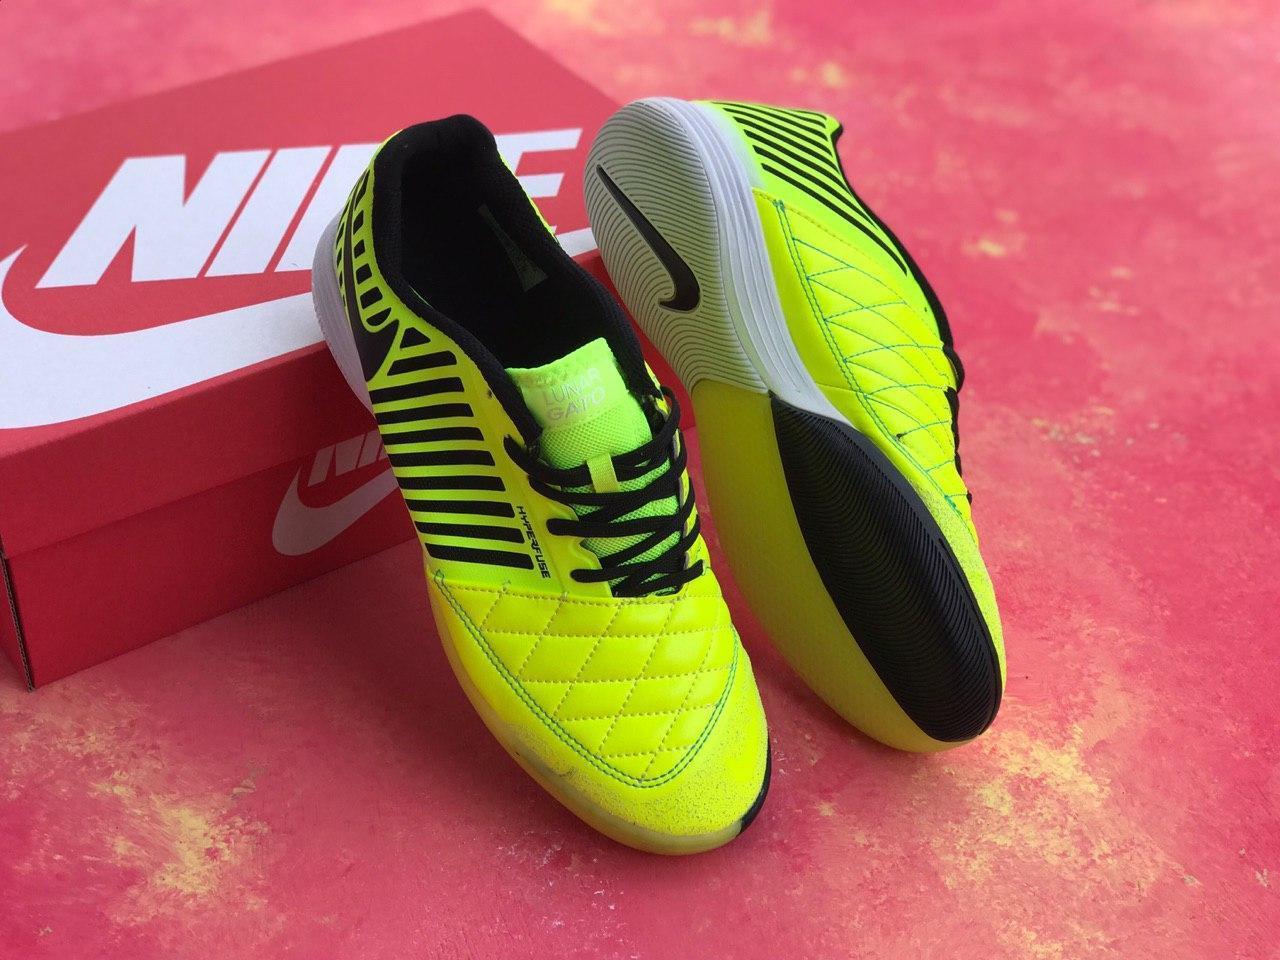 Футзалки Nike Lunar Gato II/найк лунар гато/футбольная обувь/залки